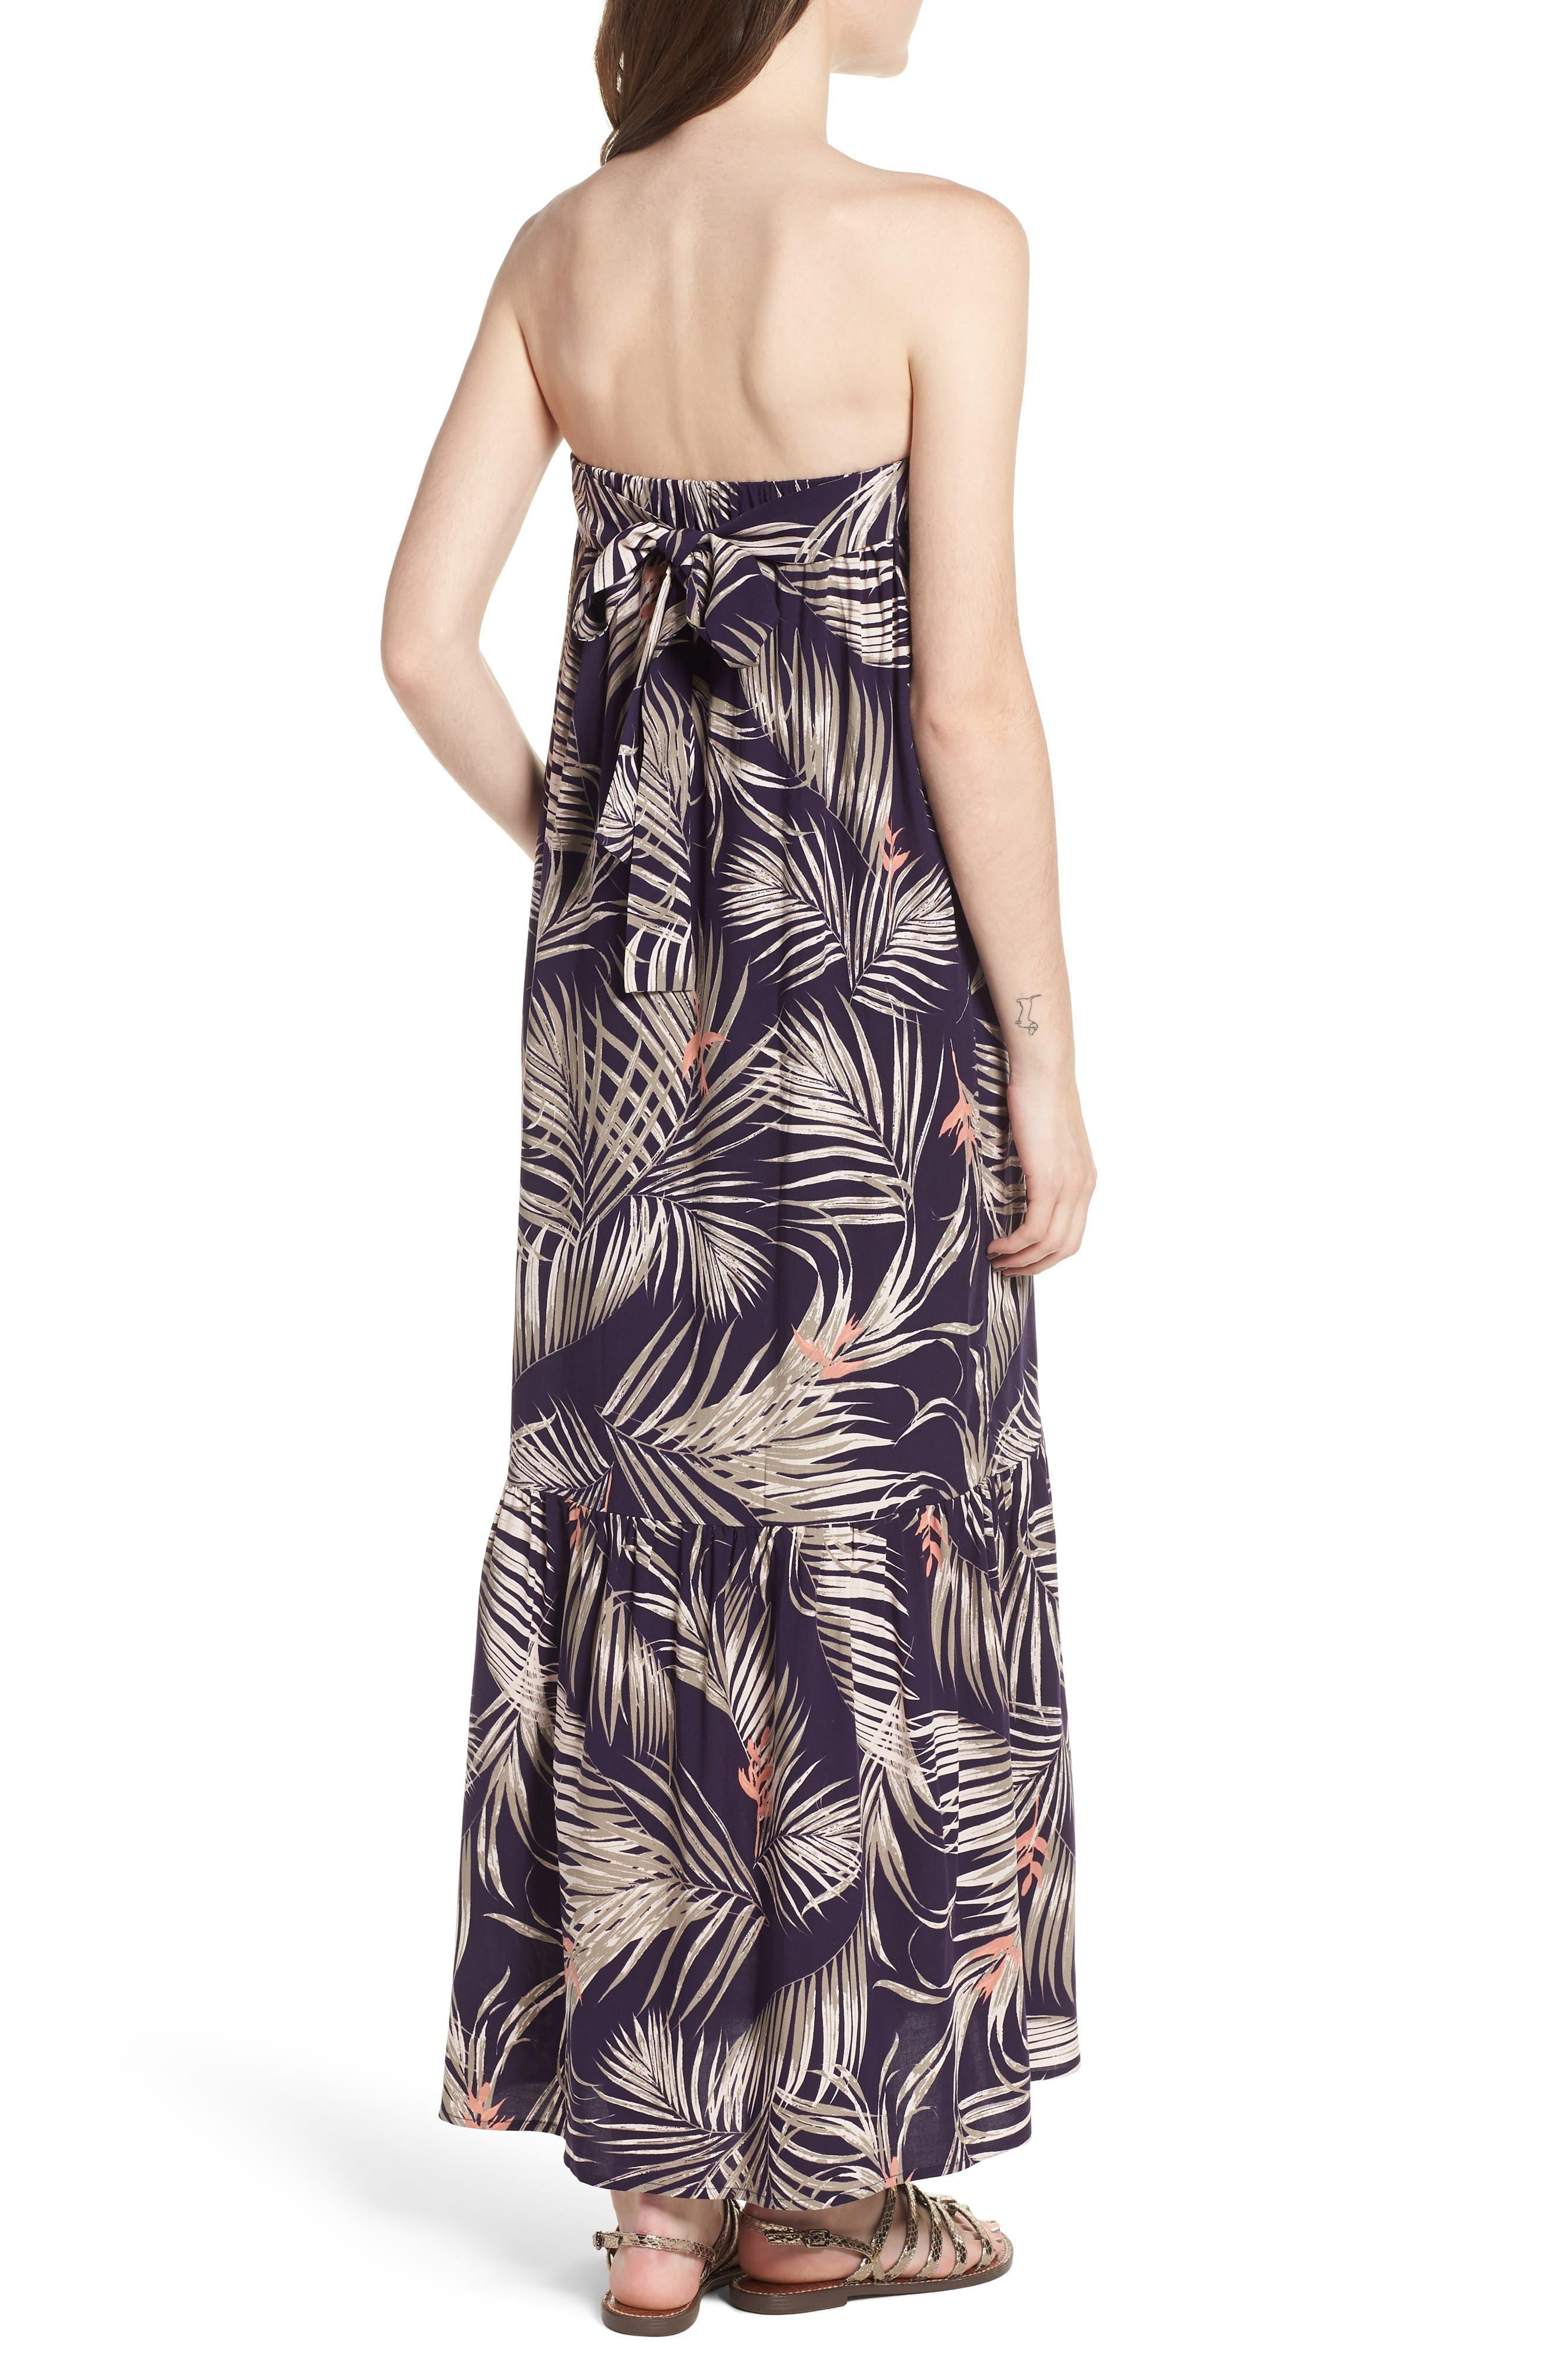 Sunset Cover-Up Maxi Dress,                             Alternate thumbnail 2, color,                             Latona Palm Evening Blue